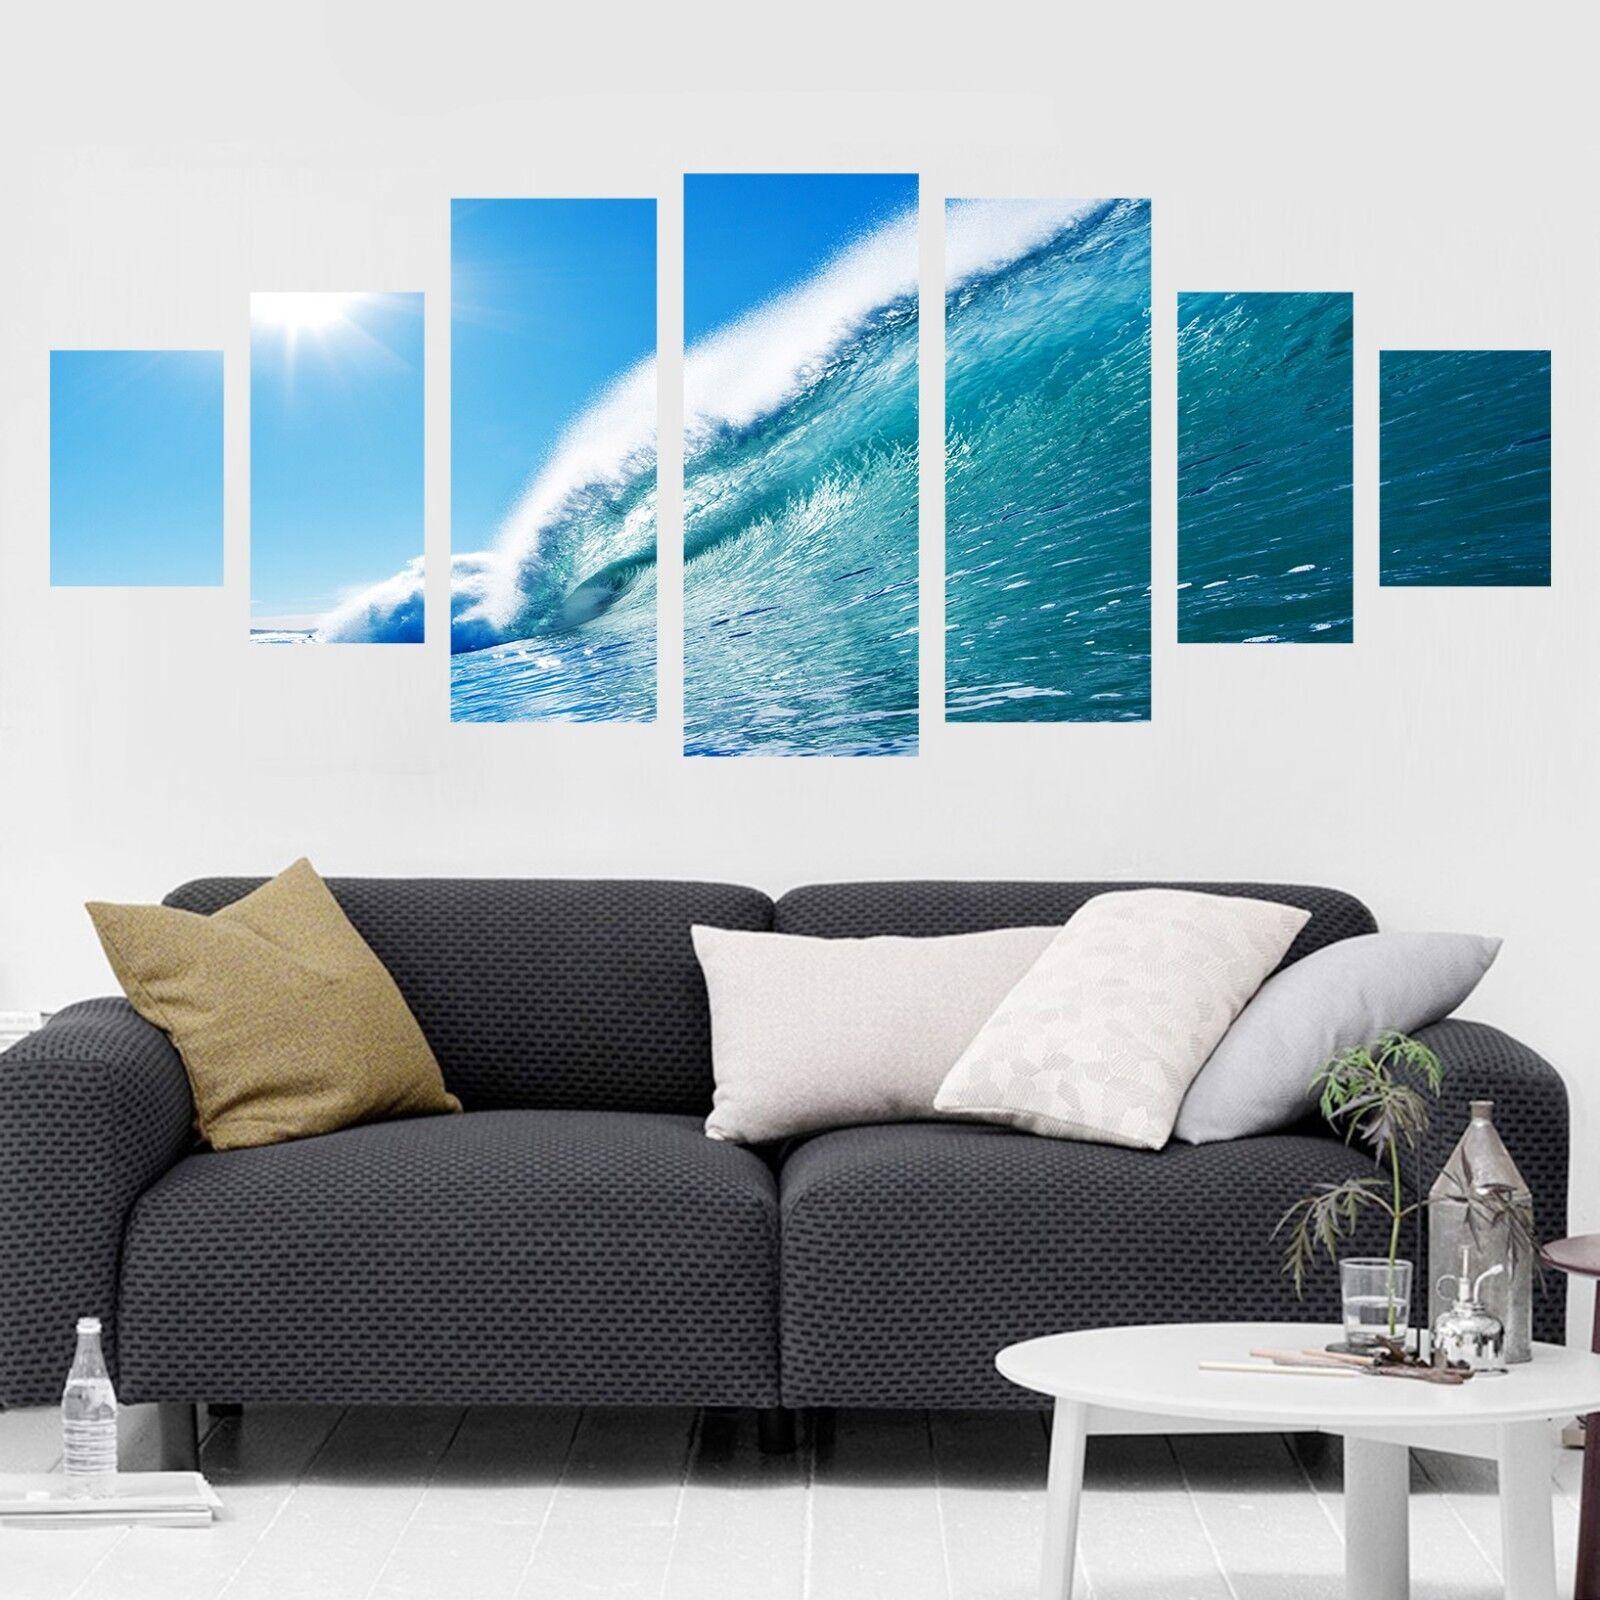 3D Sunlight Waves 656 Unframed Print Wall Paper Decal Wall Deco Indoor AJ Wall